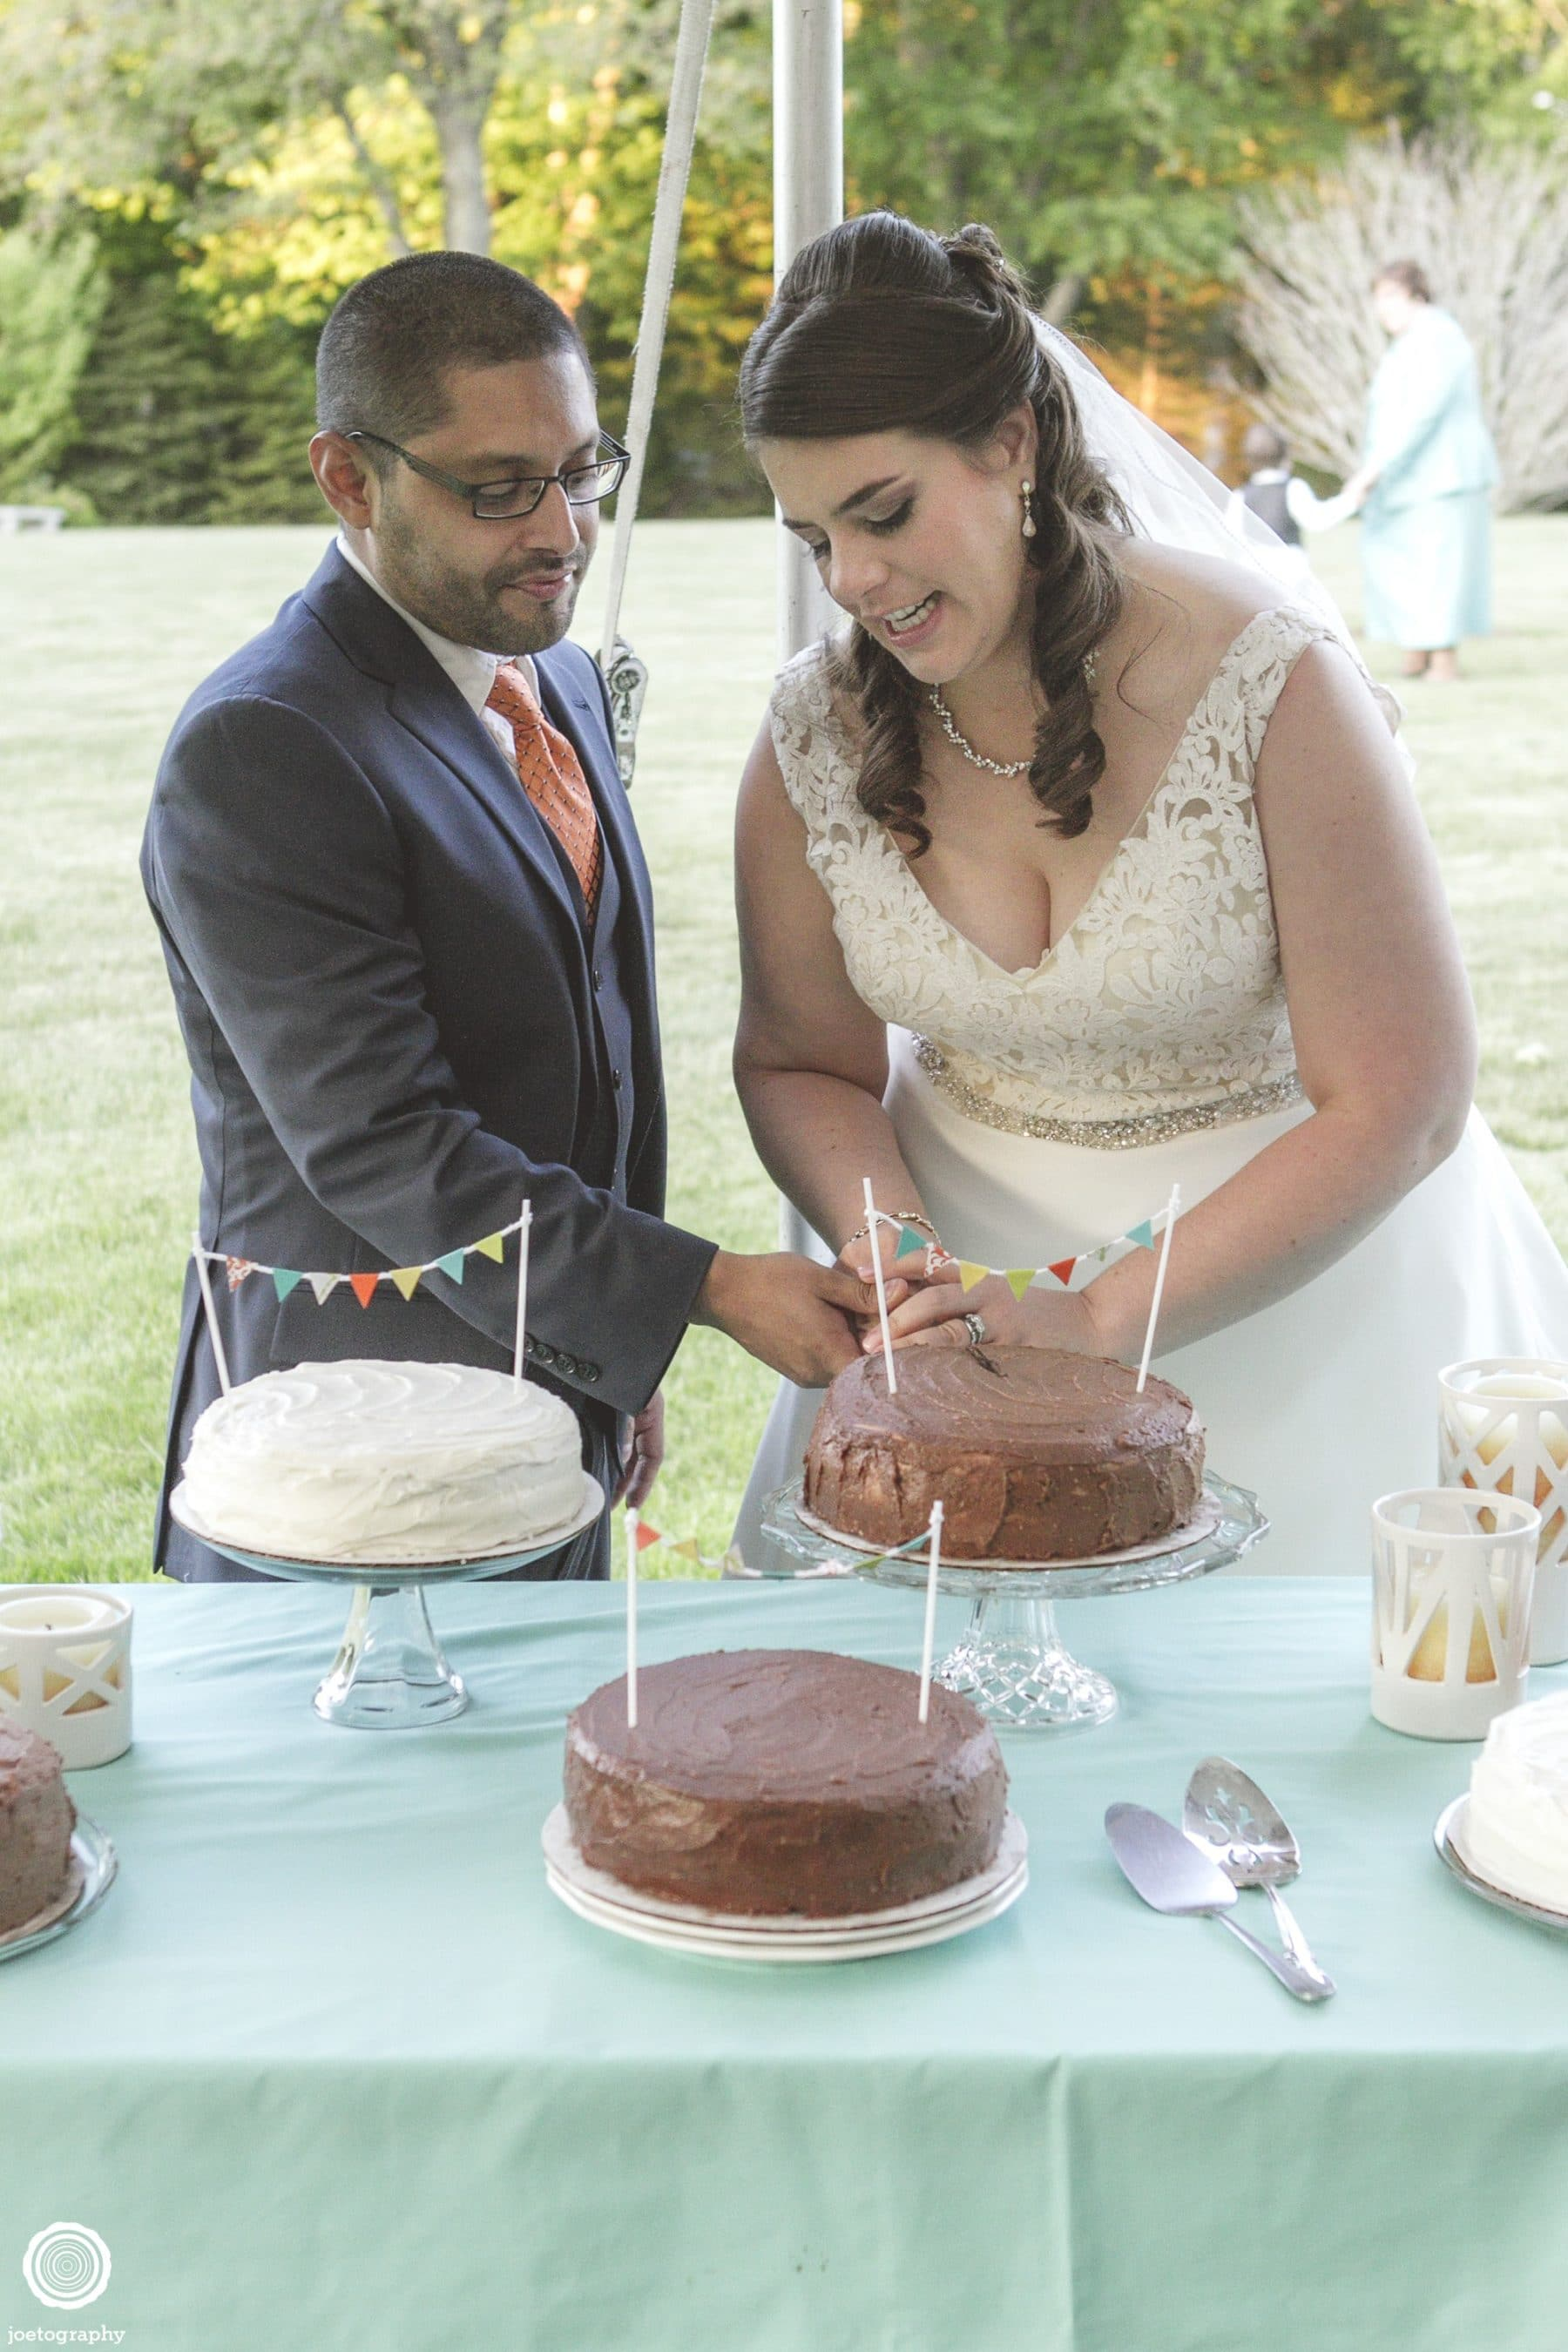 destination-wedding-fairfield-connecticut-239